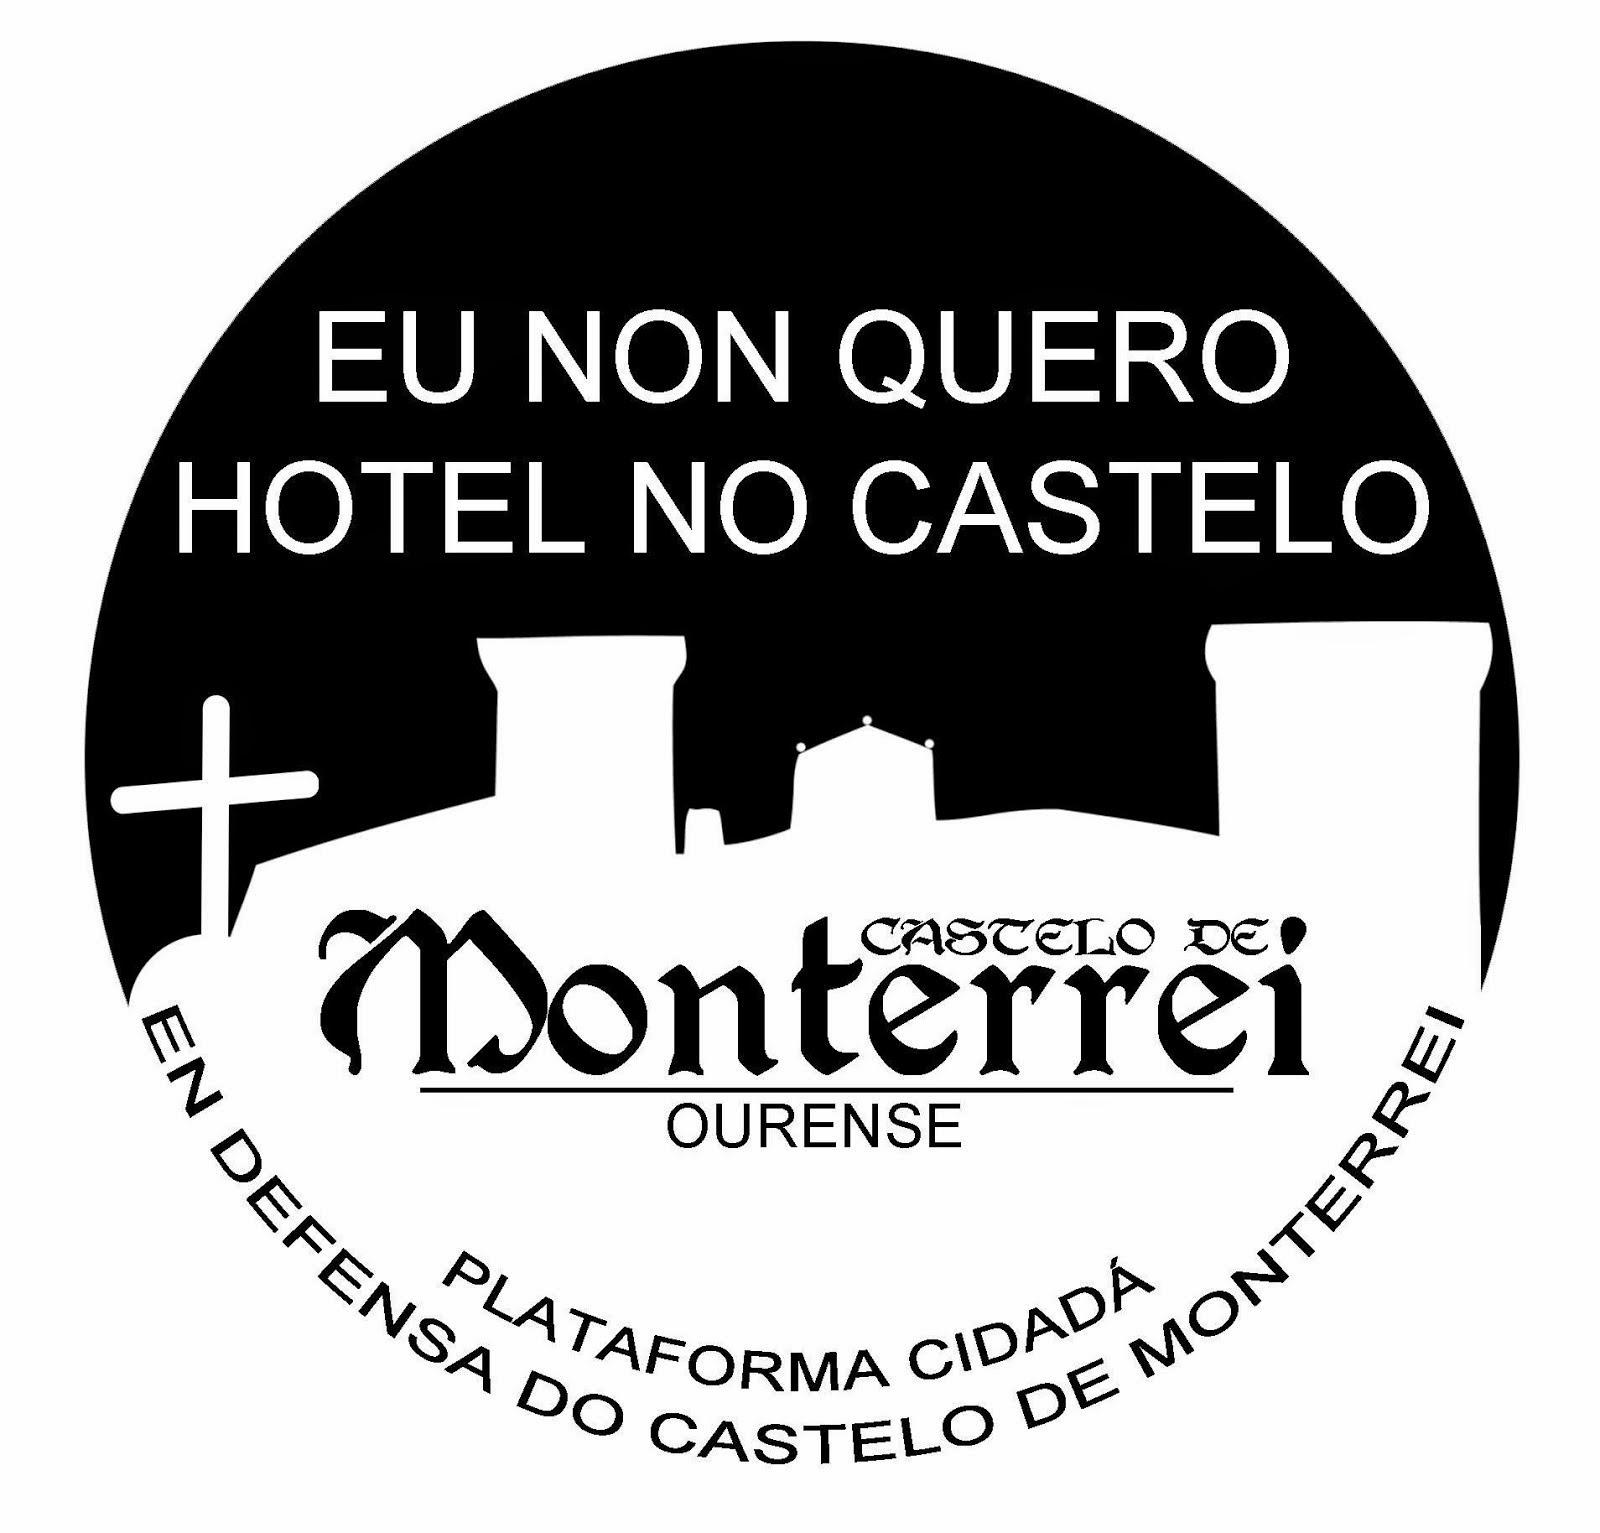 Plataforma Cidadá en Defensa do Castelo de Monterrei